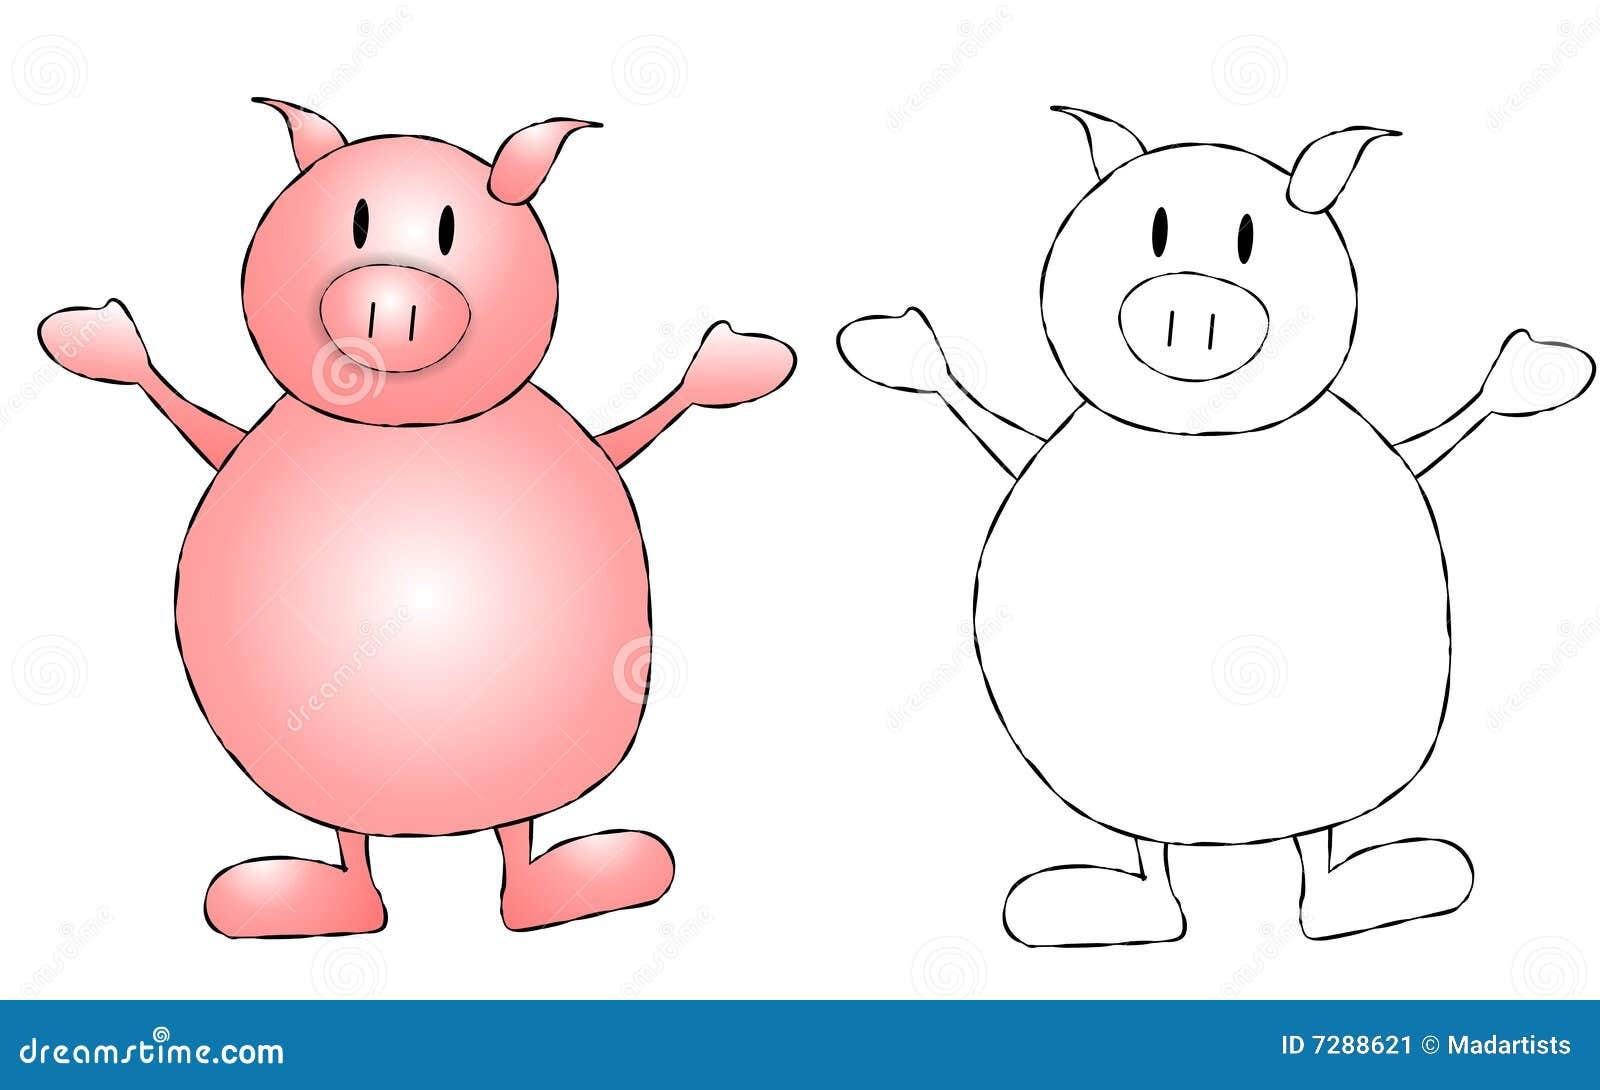 Pink Pig Clip Art Stock Image - Image: 7288621